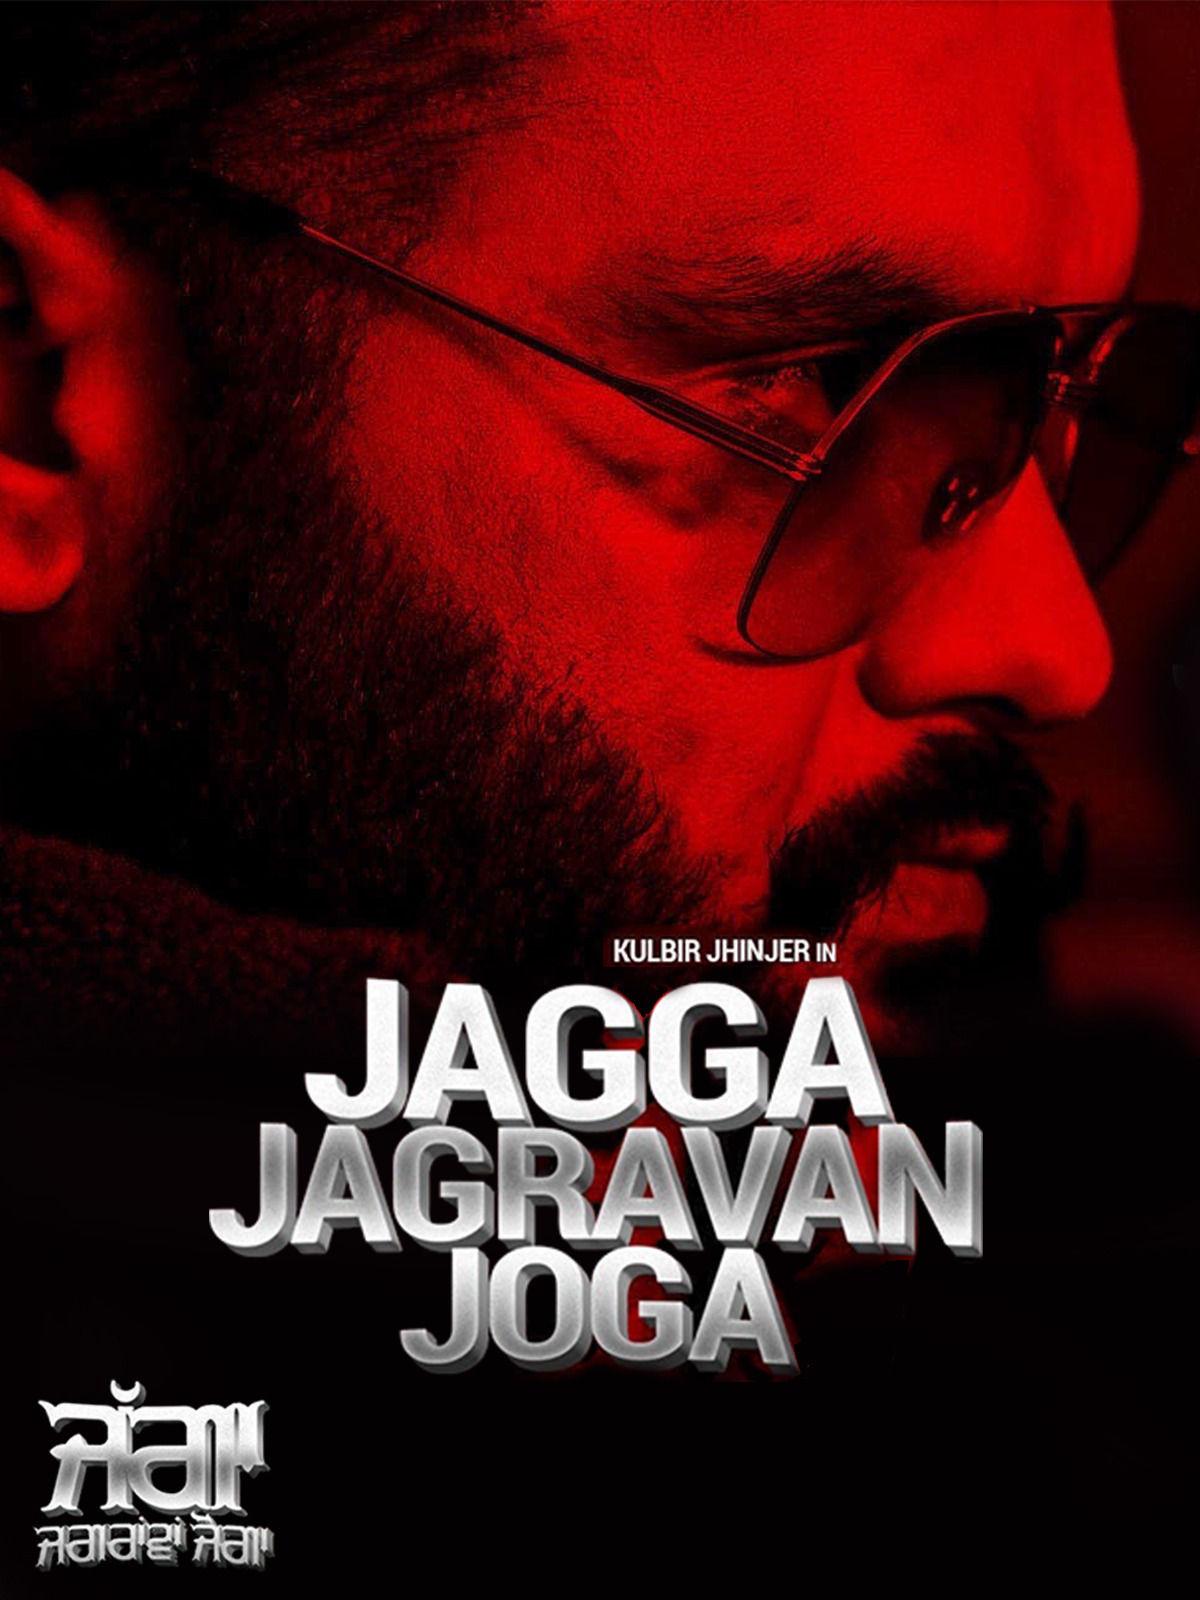 Jagga Jagravan Joga